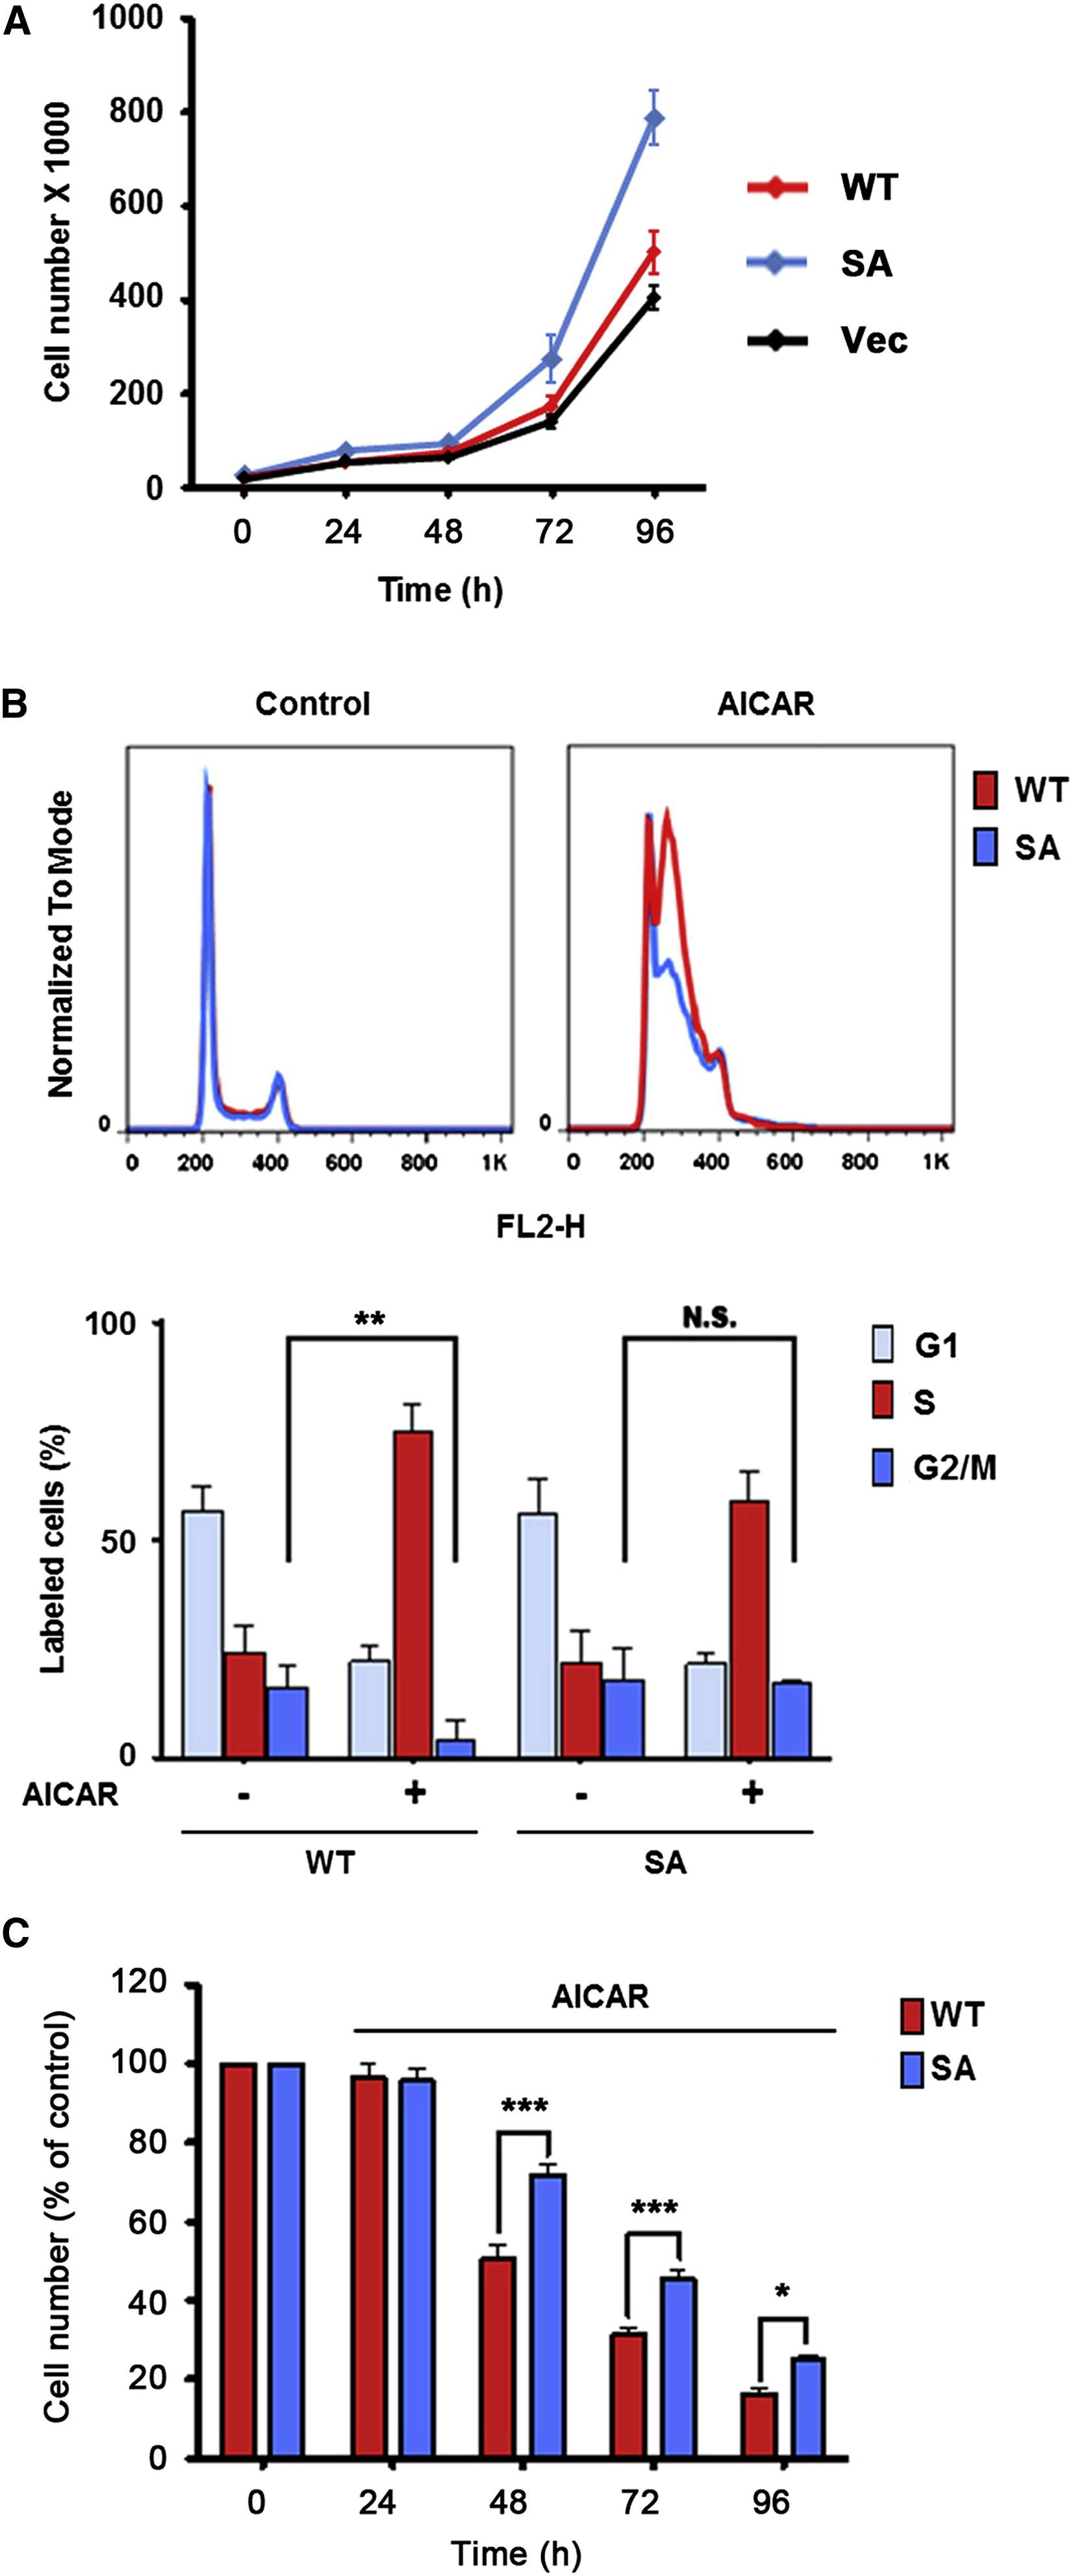 Phosphorylation Of Braf By Ampk Impairs Braf Ksr1 Association And Cell Proliferation Molecular Cell